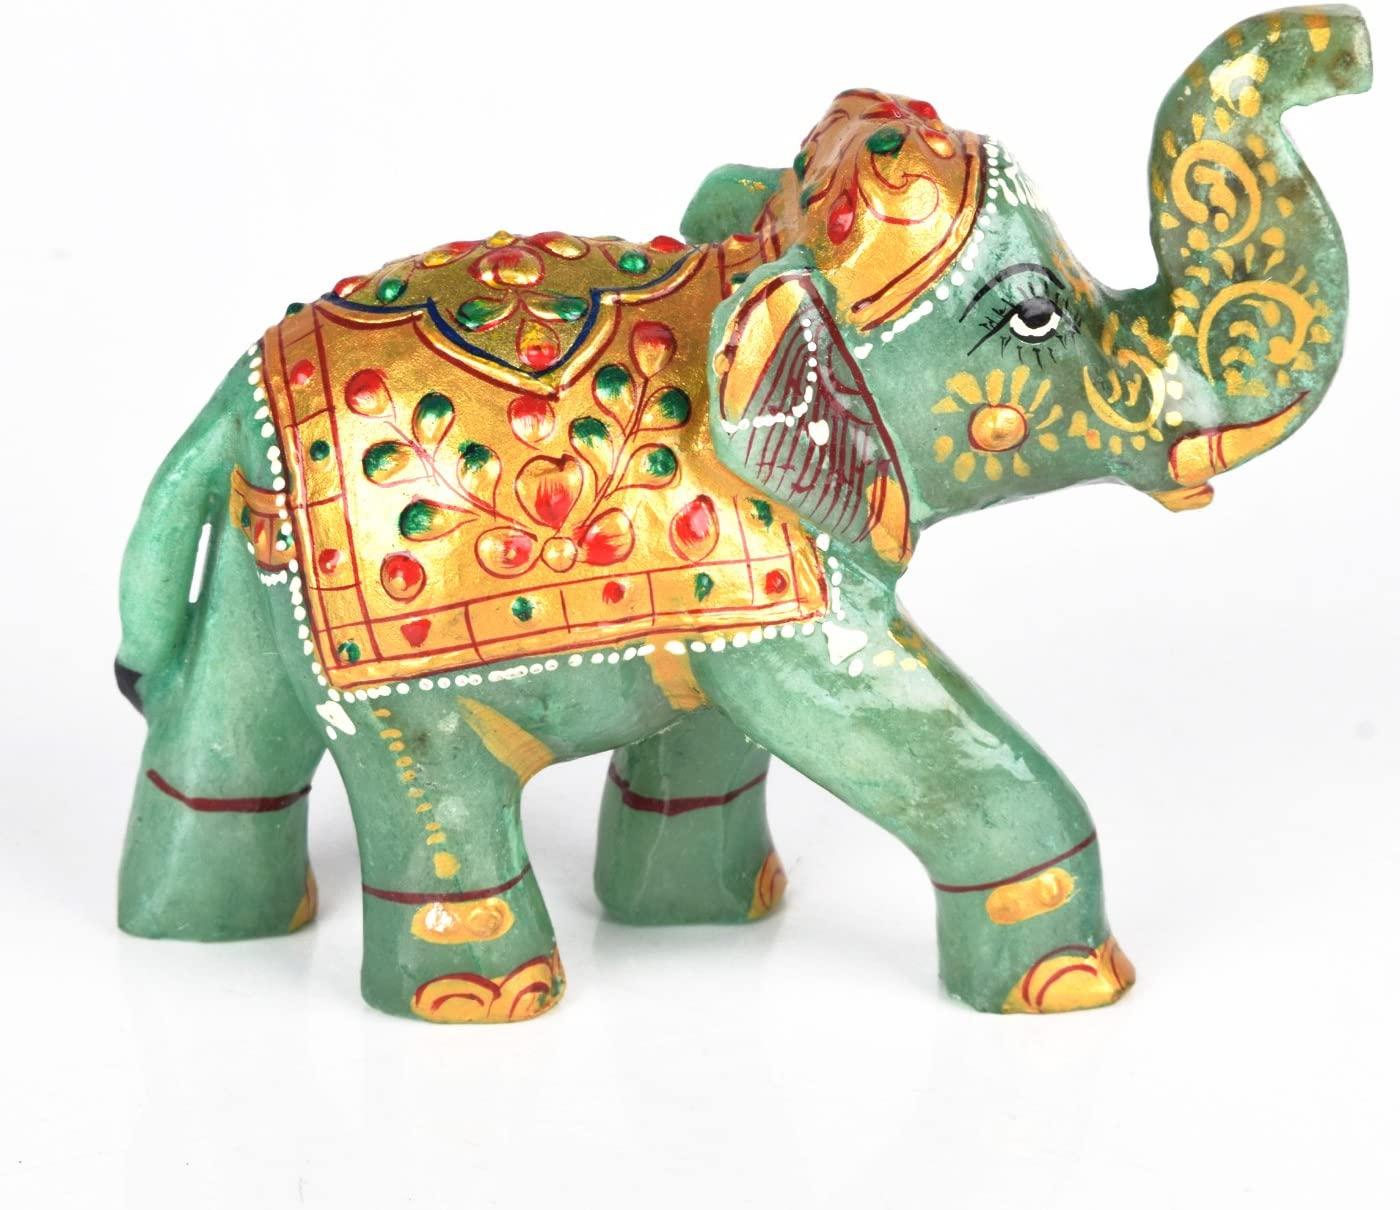 gemhub Fine Gold Work Elephant Figurine Approximately 1247.00 Ct- Green Jade Gemstone Elephants Statue DB-468